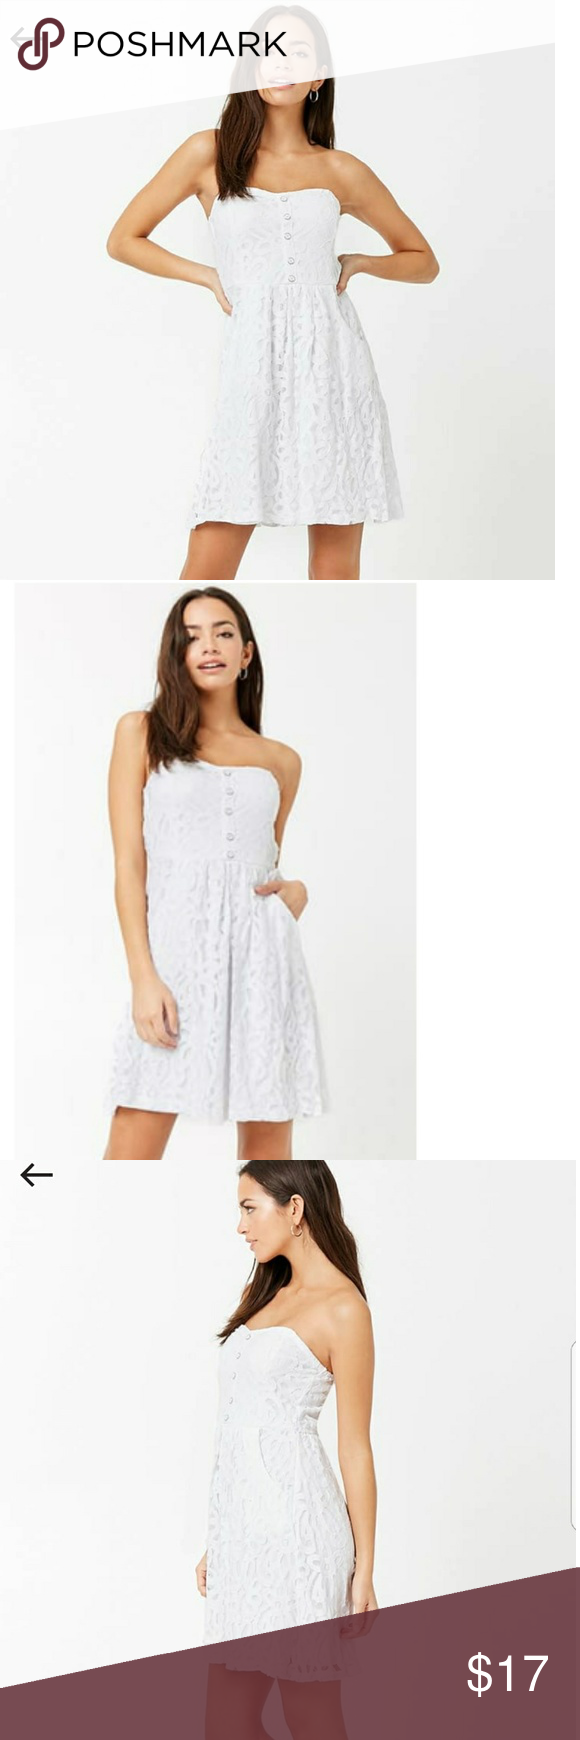 ea7b9cc592b White Lace Mini Tube Dress A knit tube dress featuring embroidered lace  design